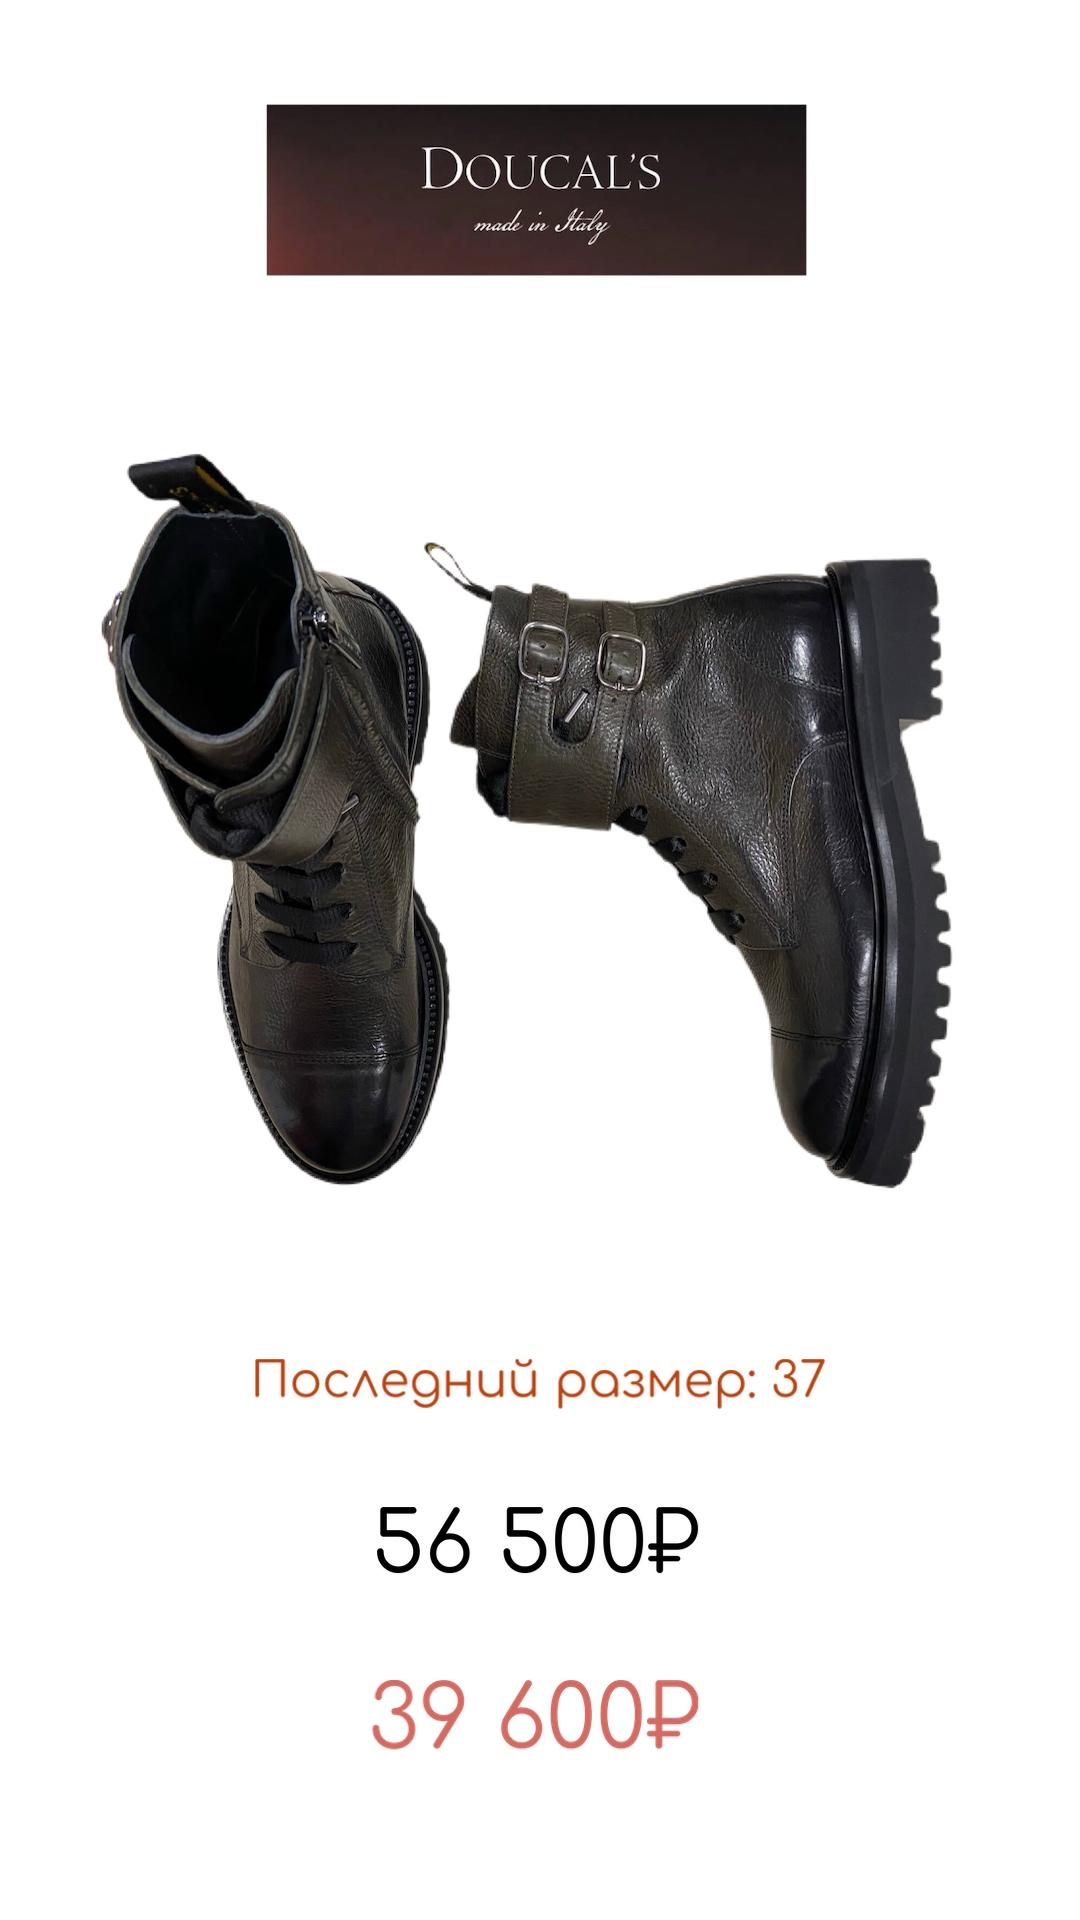 gallery_1_pust-ves-mir-budet-u-vashih-nog-10